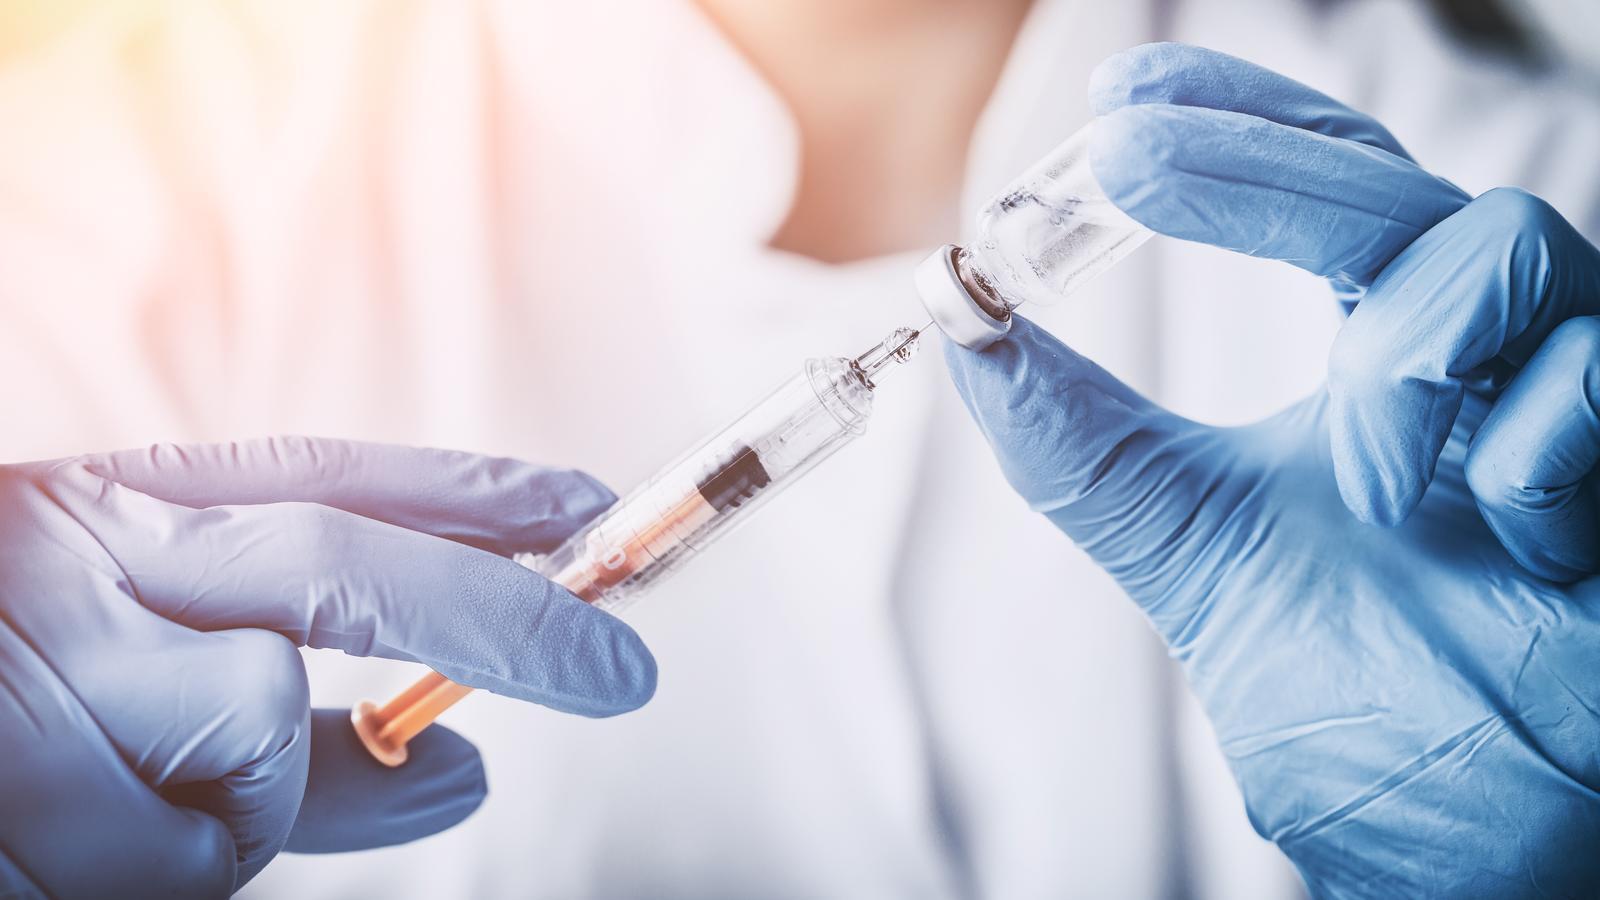 Das Robert-Koch-Institut empfiehlt, wann welche Impfung sinnvoll ist.